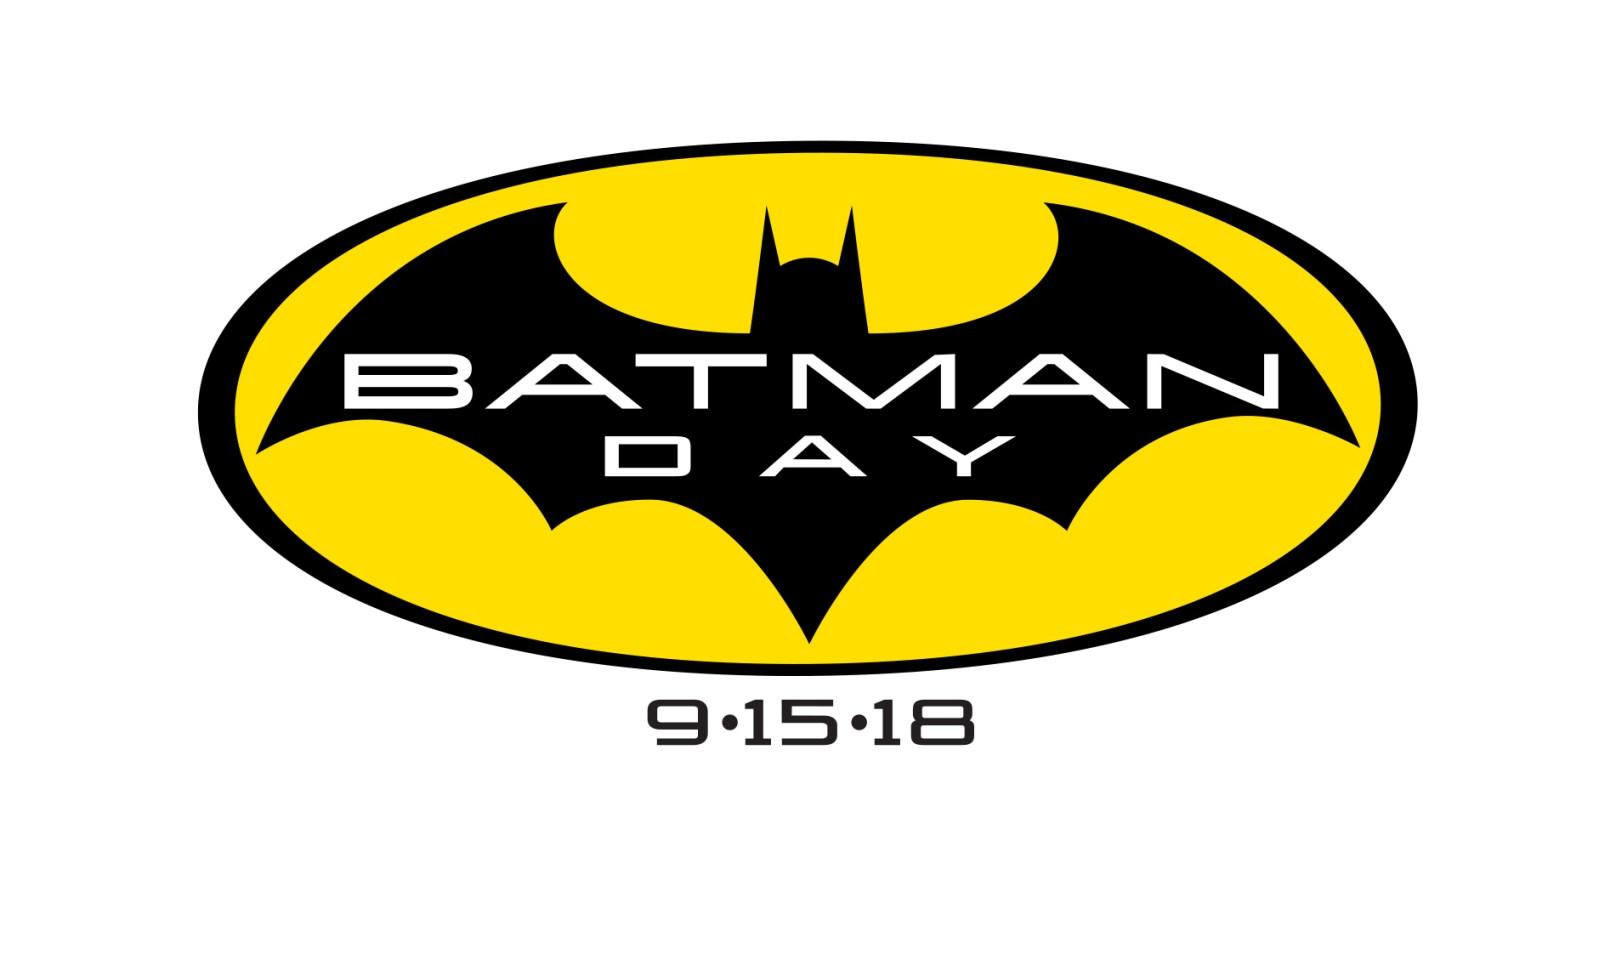 Batman Day Logo 2018